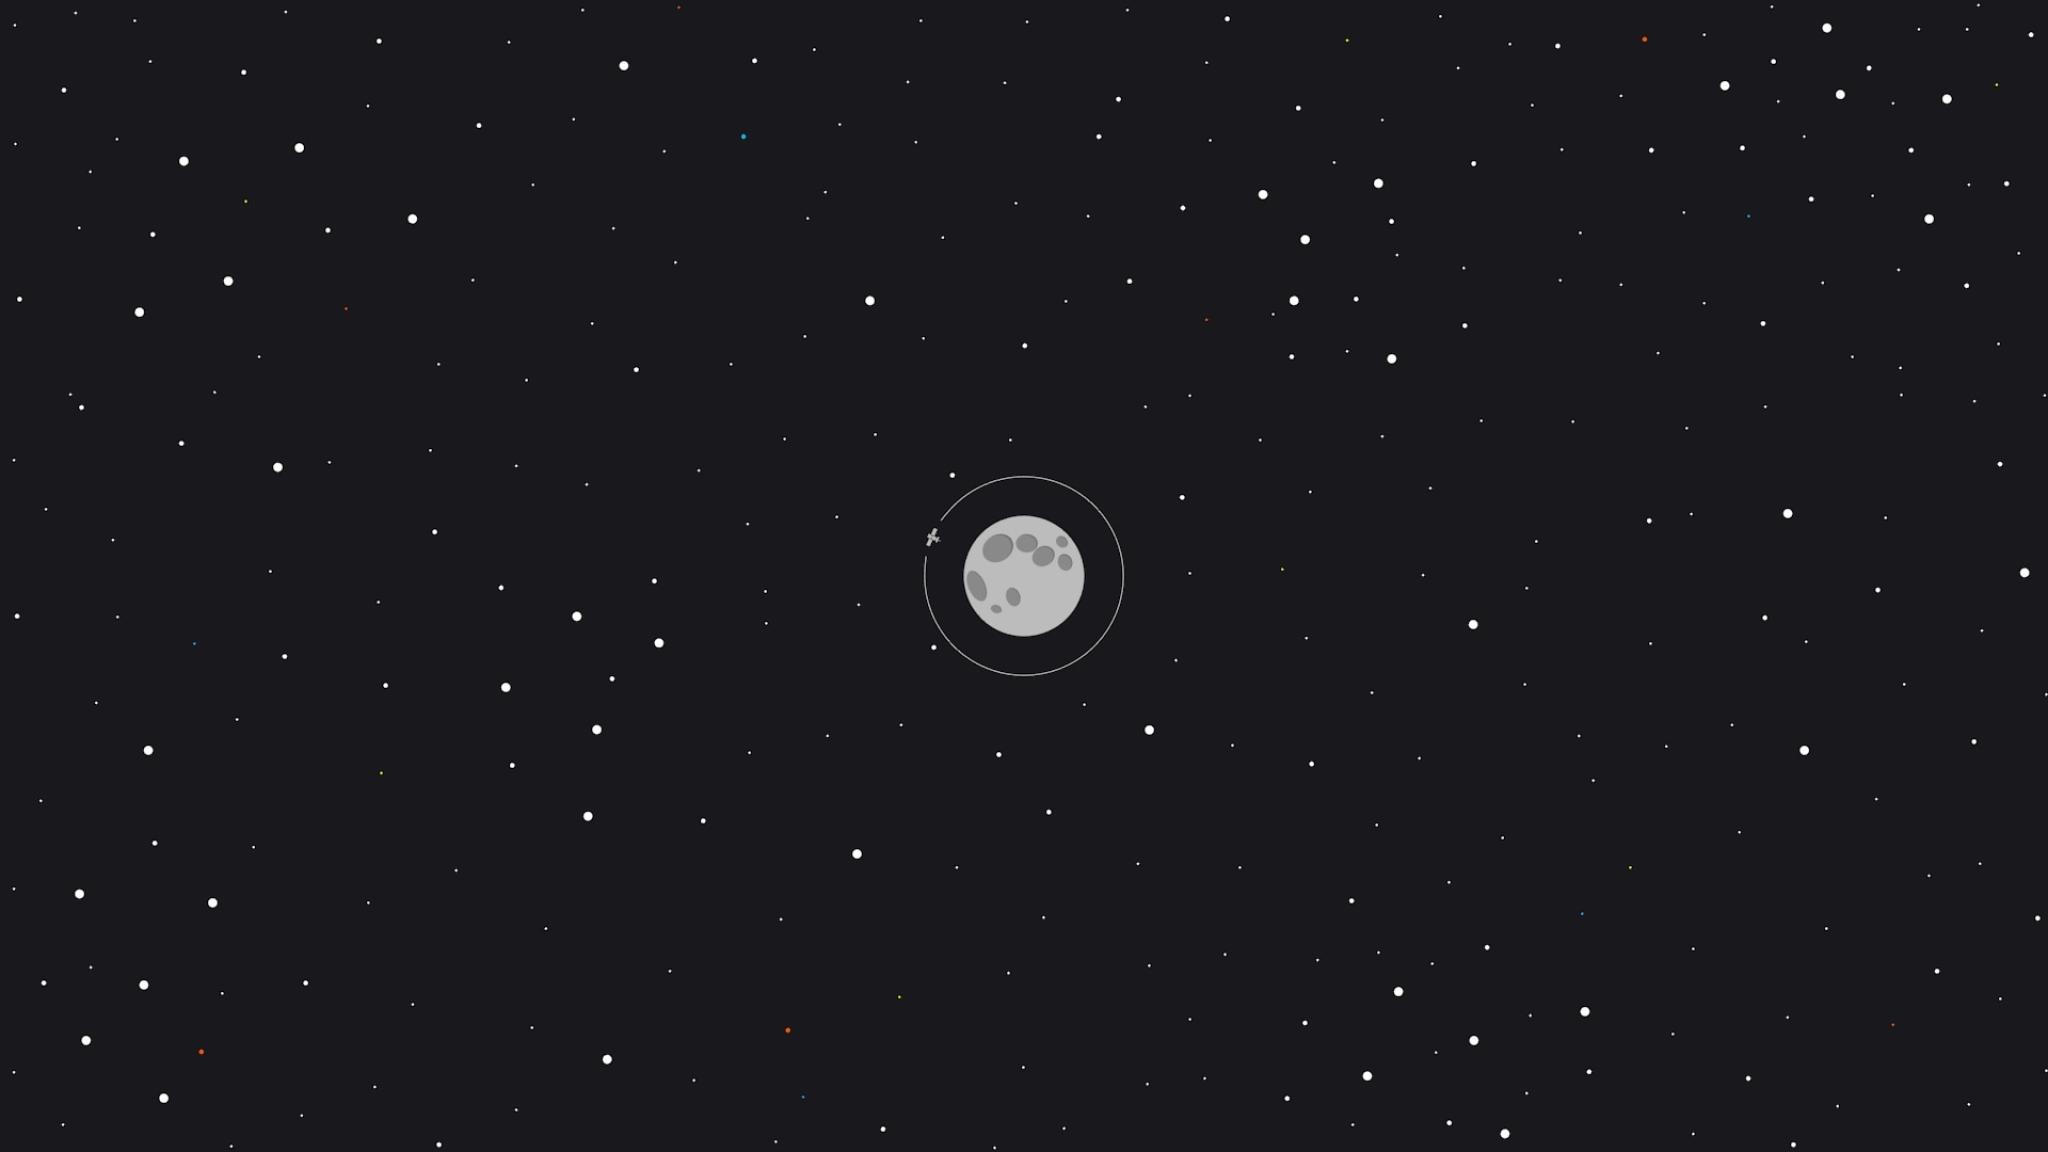 2048x1152 Moon Space Minimal 2048x1152 Resolution Wallpaper